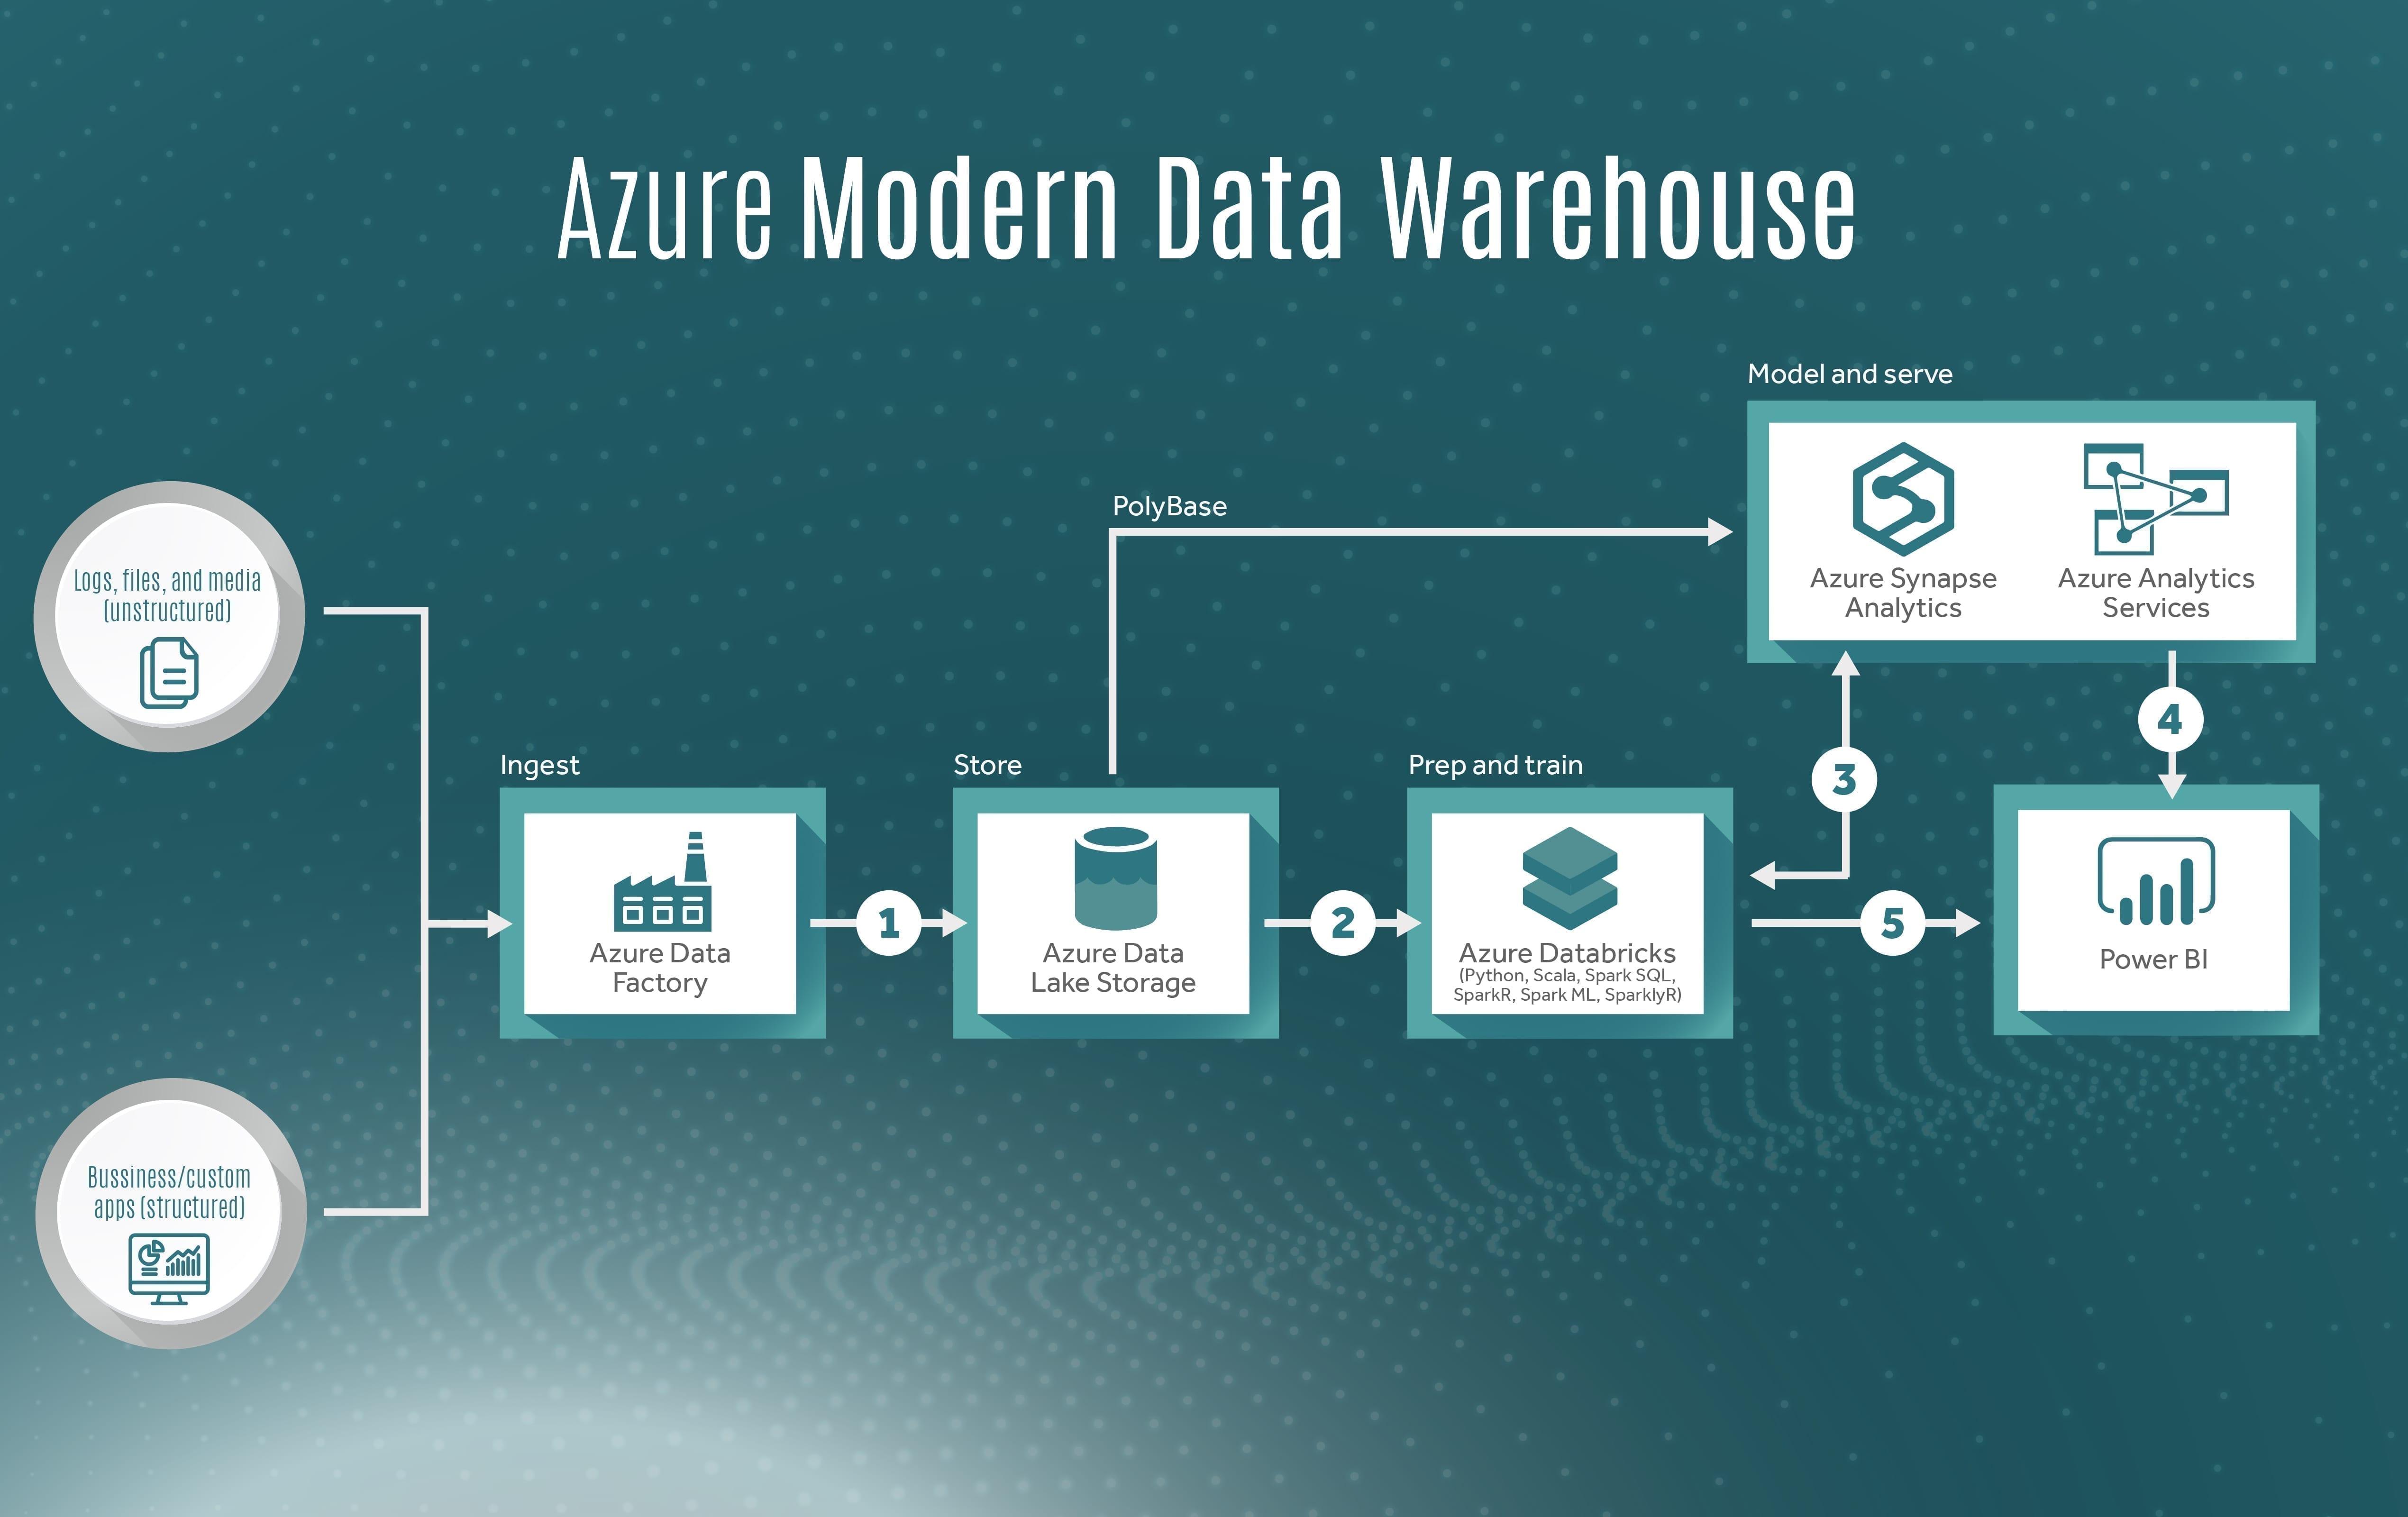 Azure Modern Data Warehouse